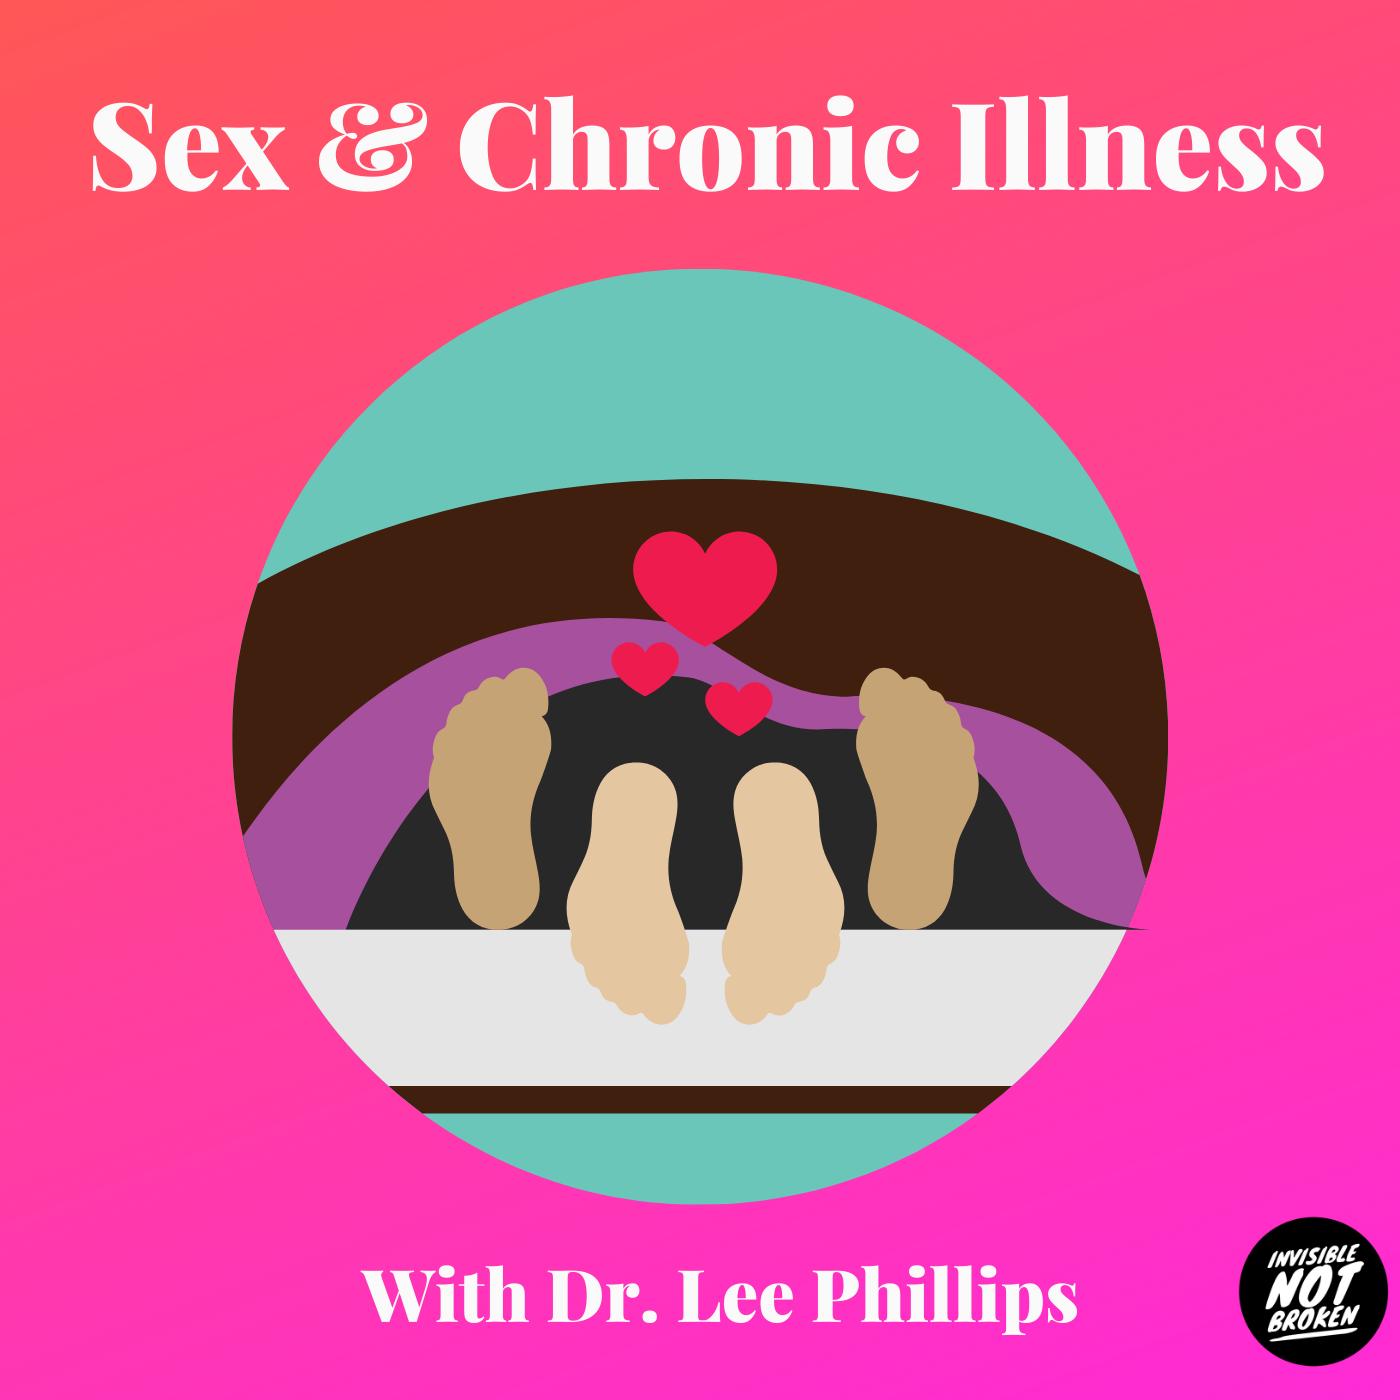 Sex and Chronic Illness